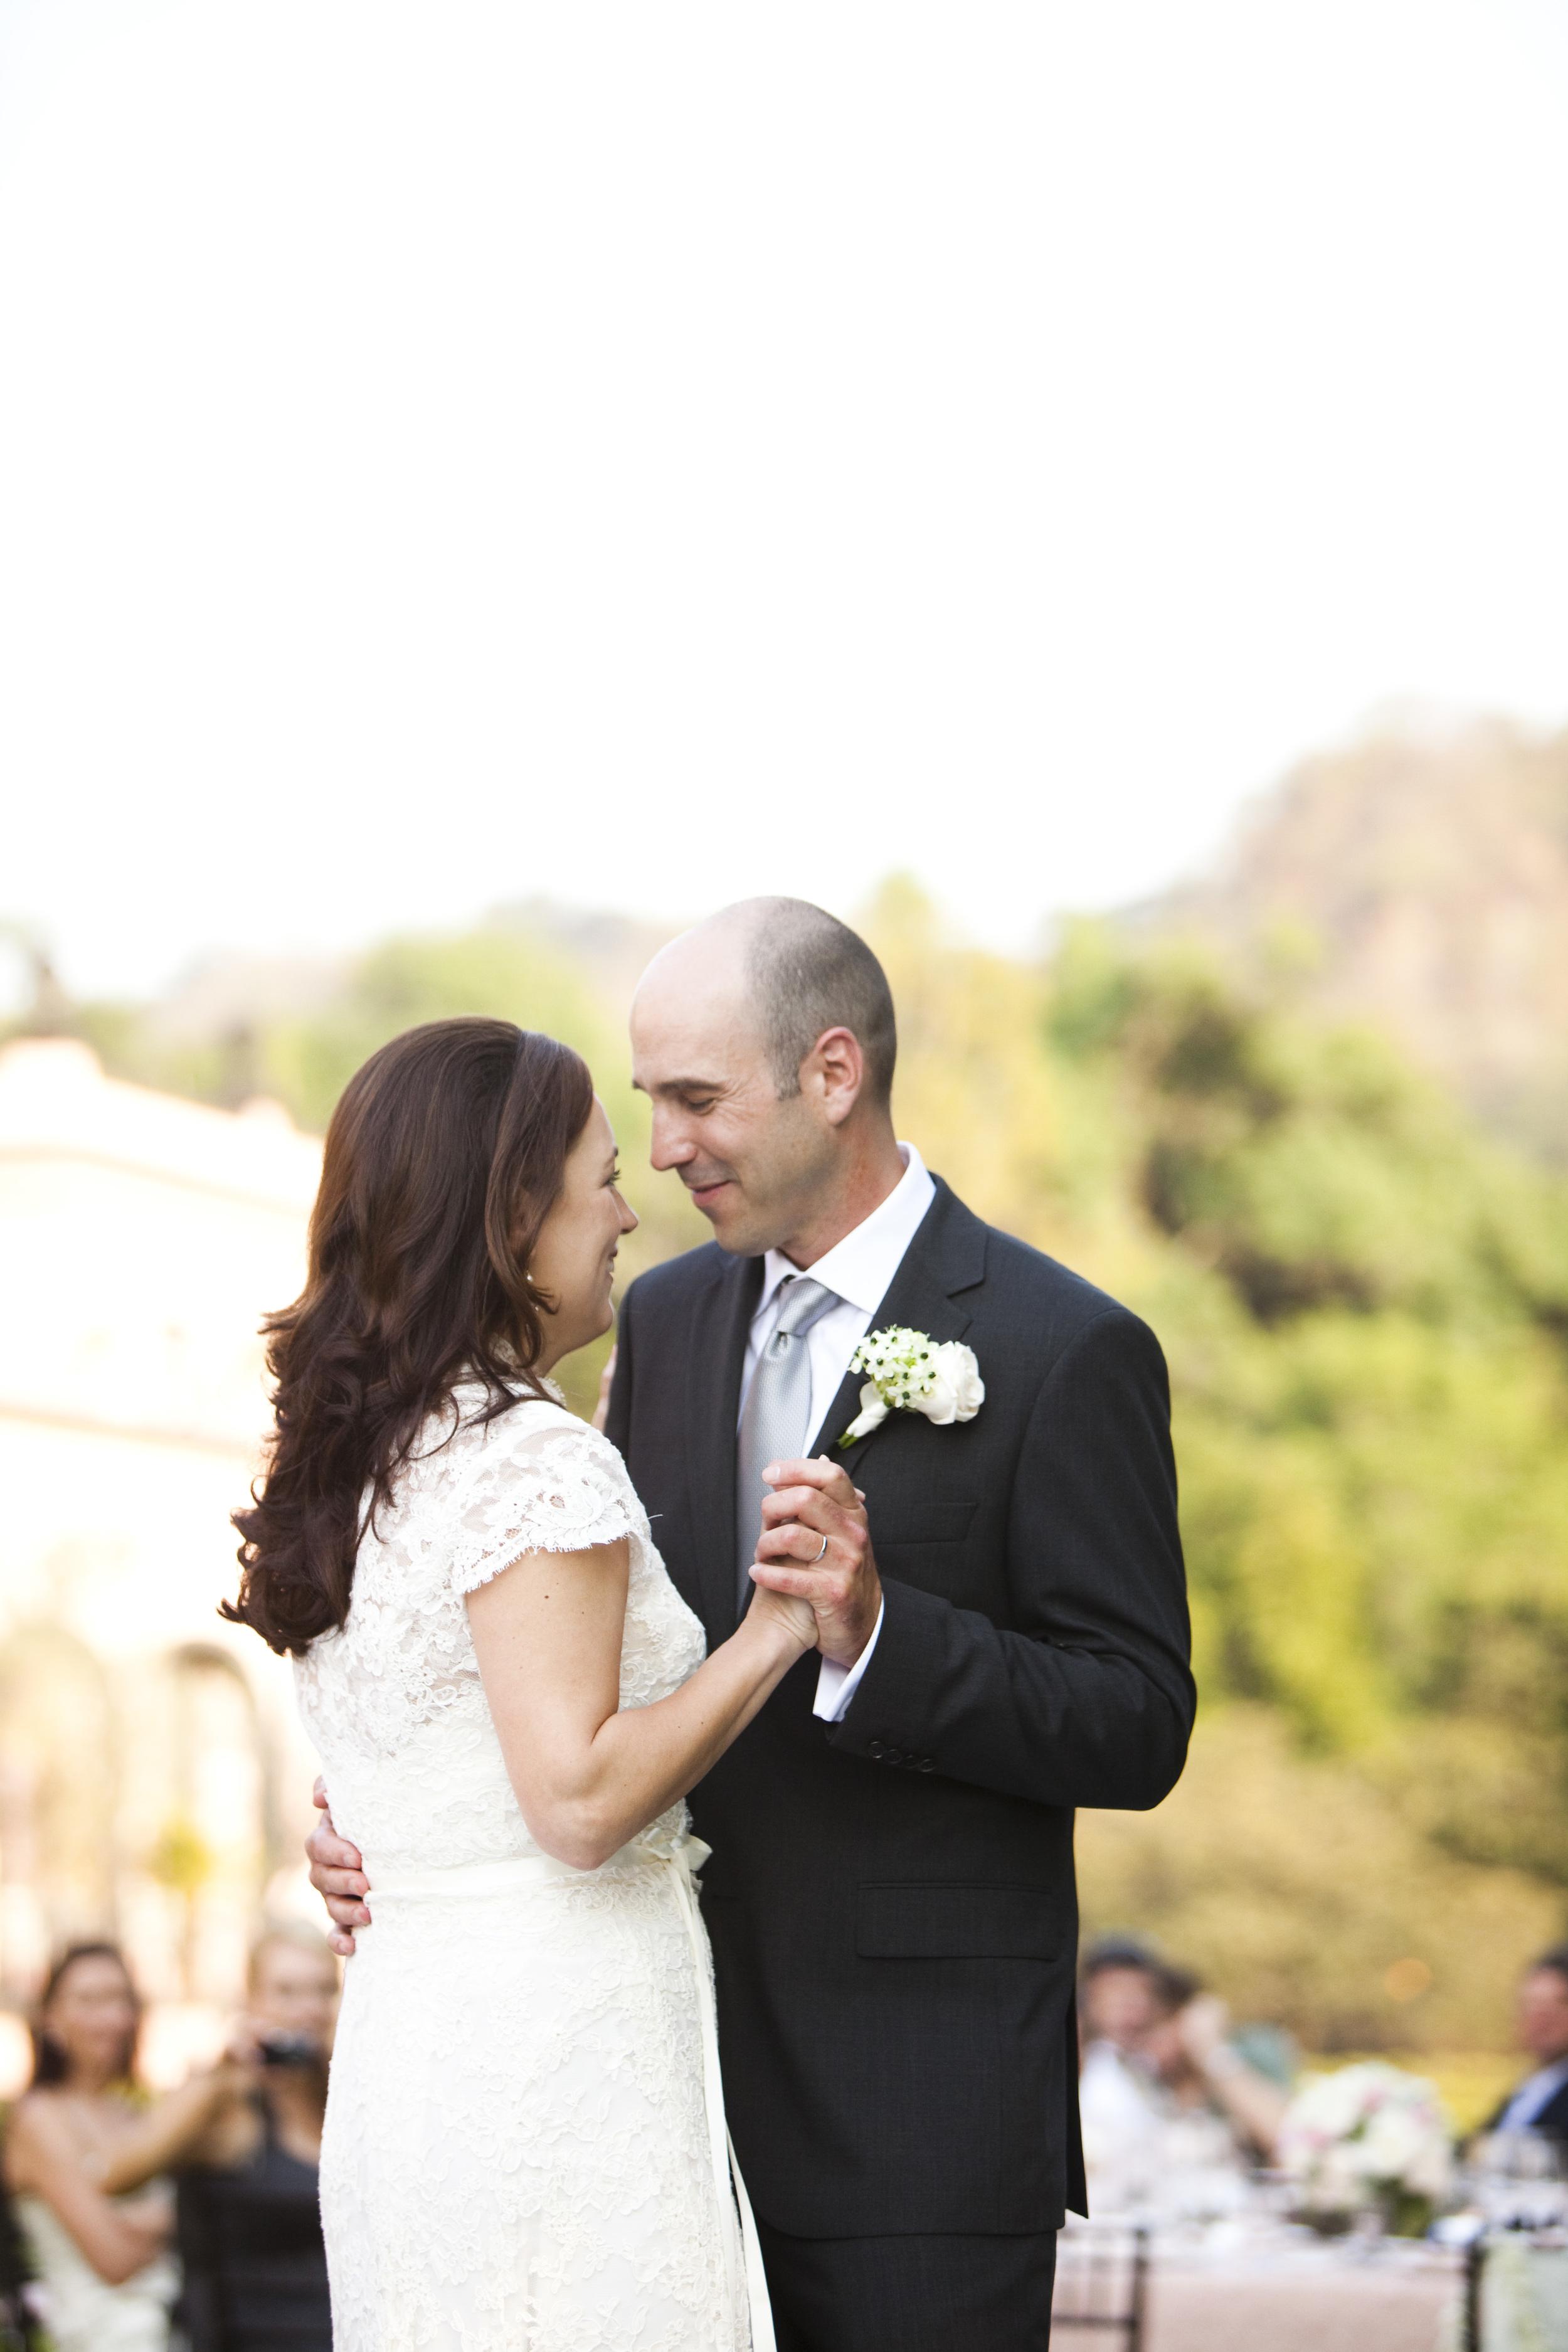 Ceci_New_York_Style_Luxury_Custom_Mexico_Wedding_CeciBride_Letterpress_NewYork_Foil_Hacienda_de_San_Antonio_44.jpg